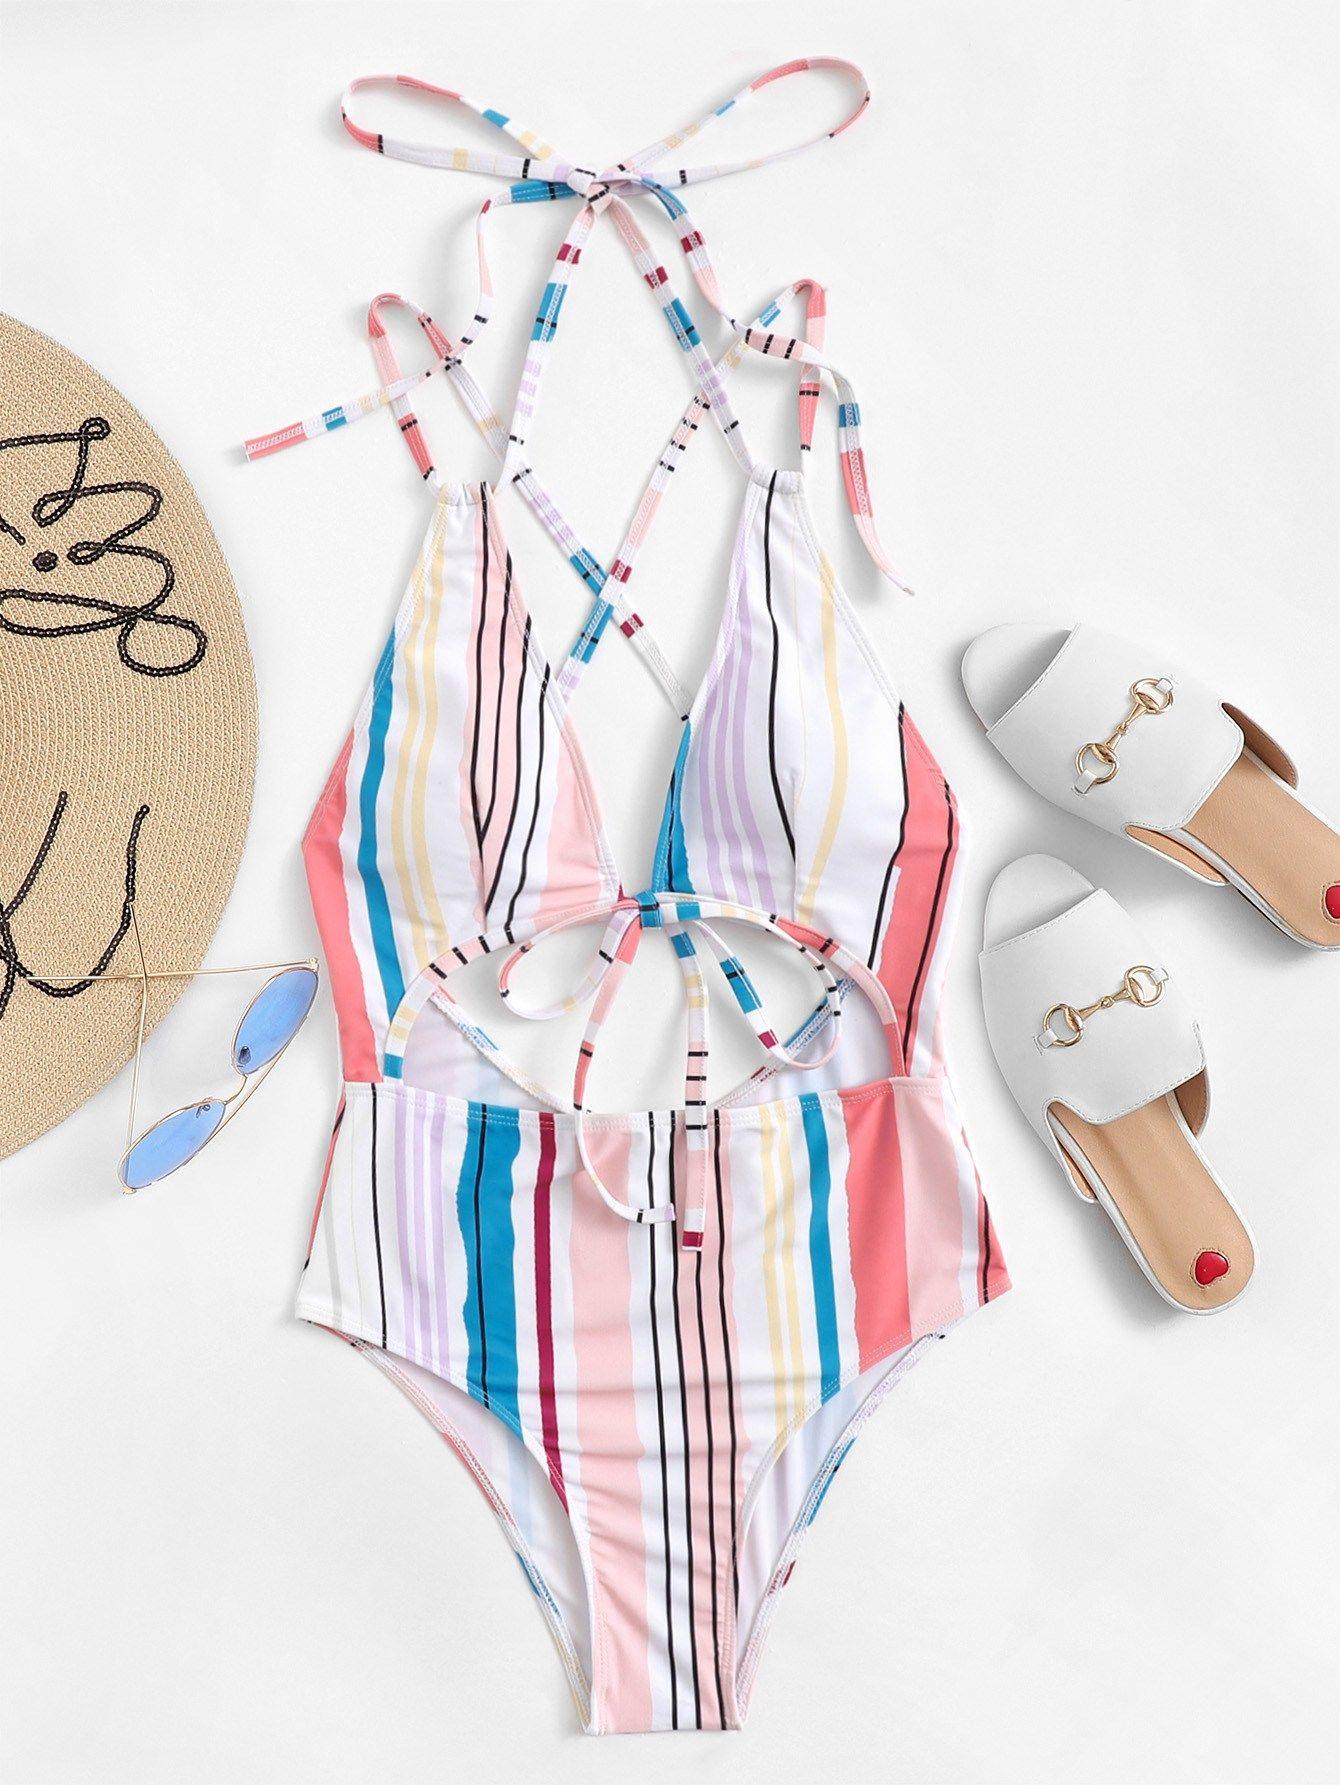 db5c949156 Cut-out Criss Cross Random Striped Swimsuit Cross#Criss#Cut ...